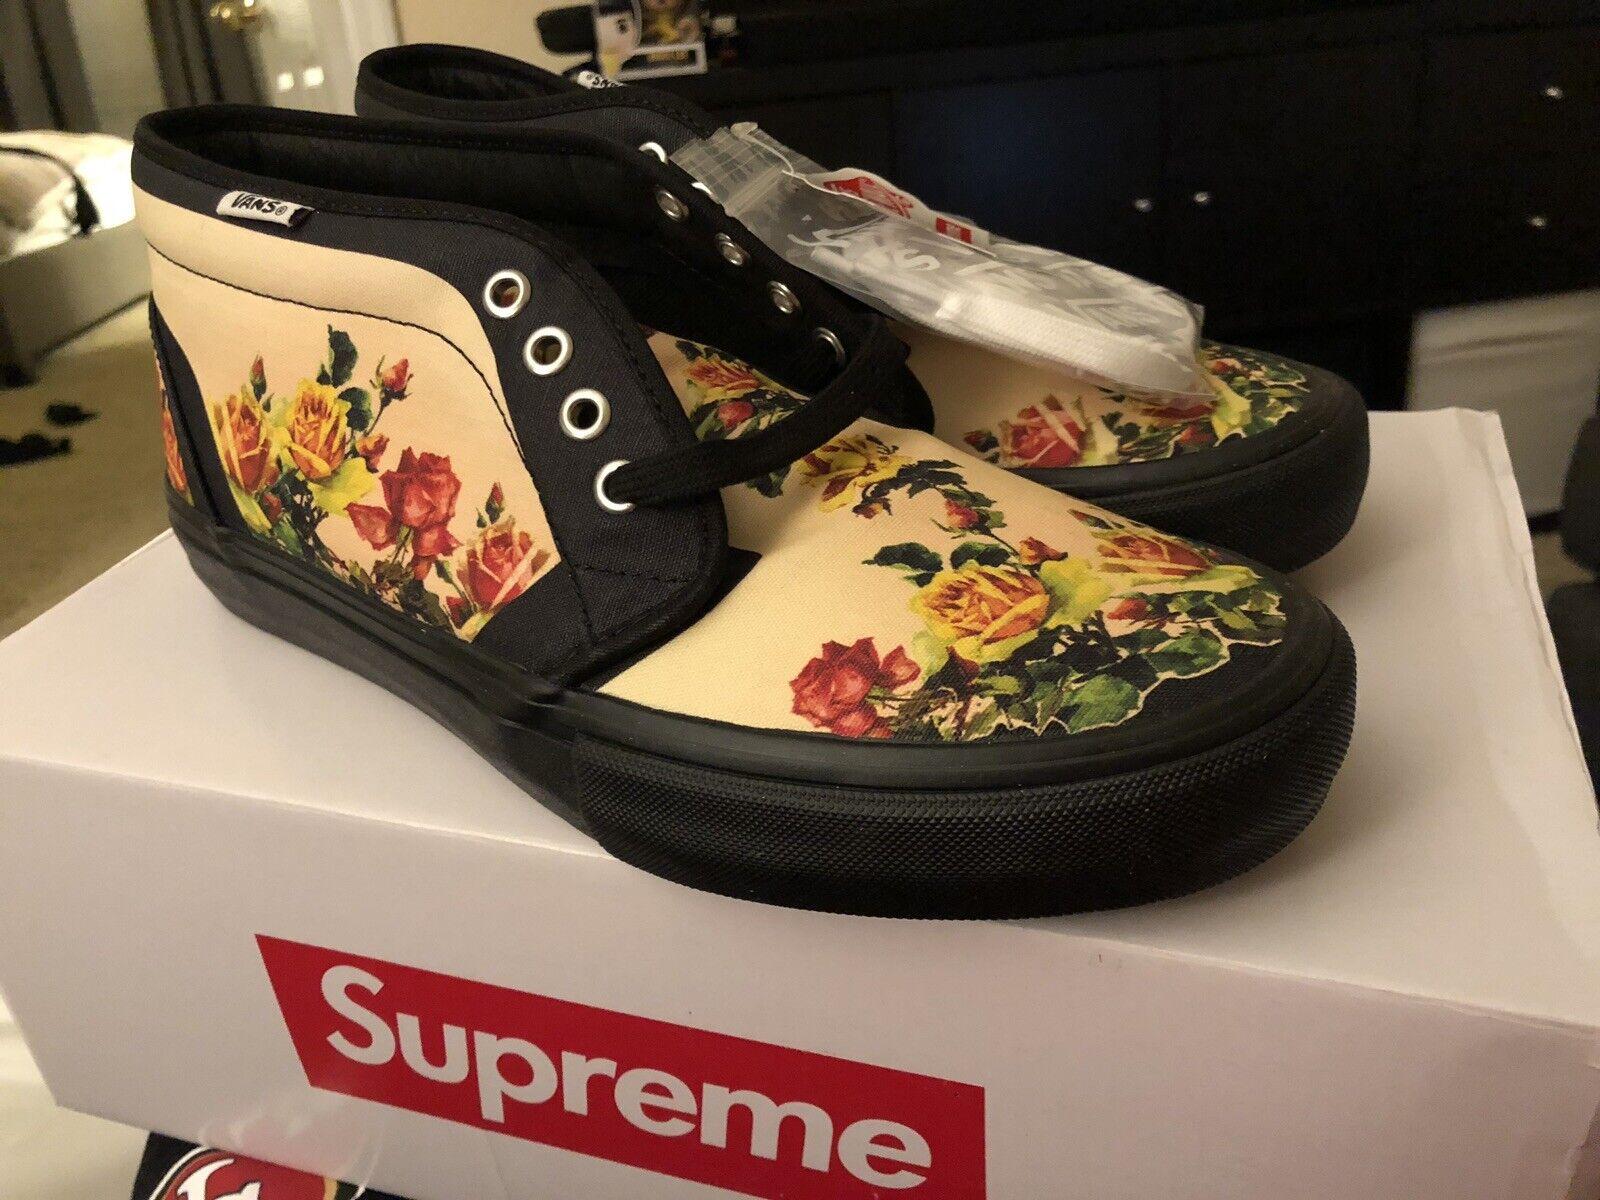 Supreme ® Vans ® Jean Paul Gaultier ® Floral Print Chukka Pro